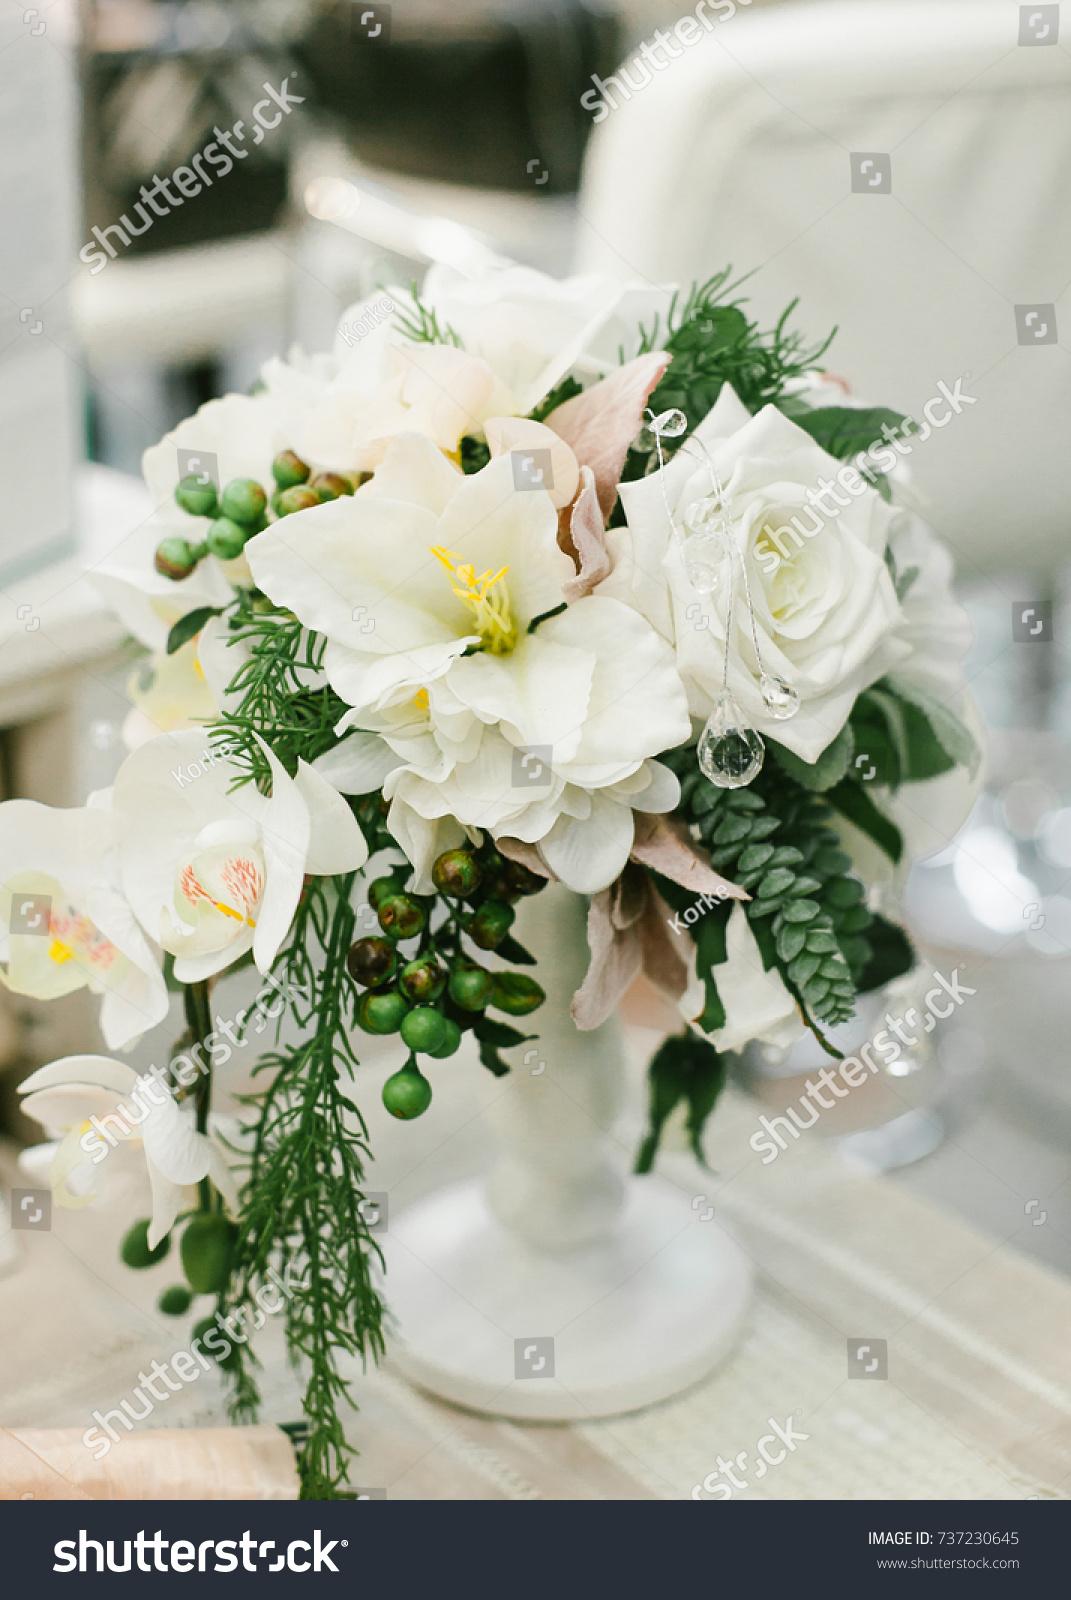 Wedding Table Centerpieces White Floral Composition Stock Photo Edit Now 737230645